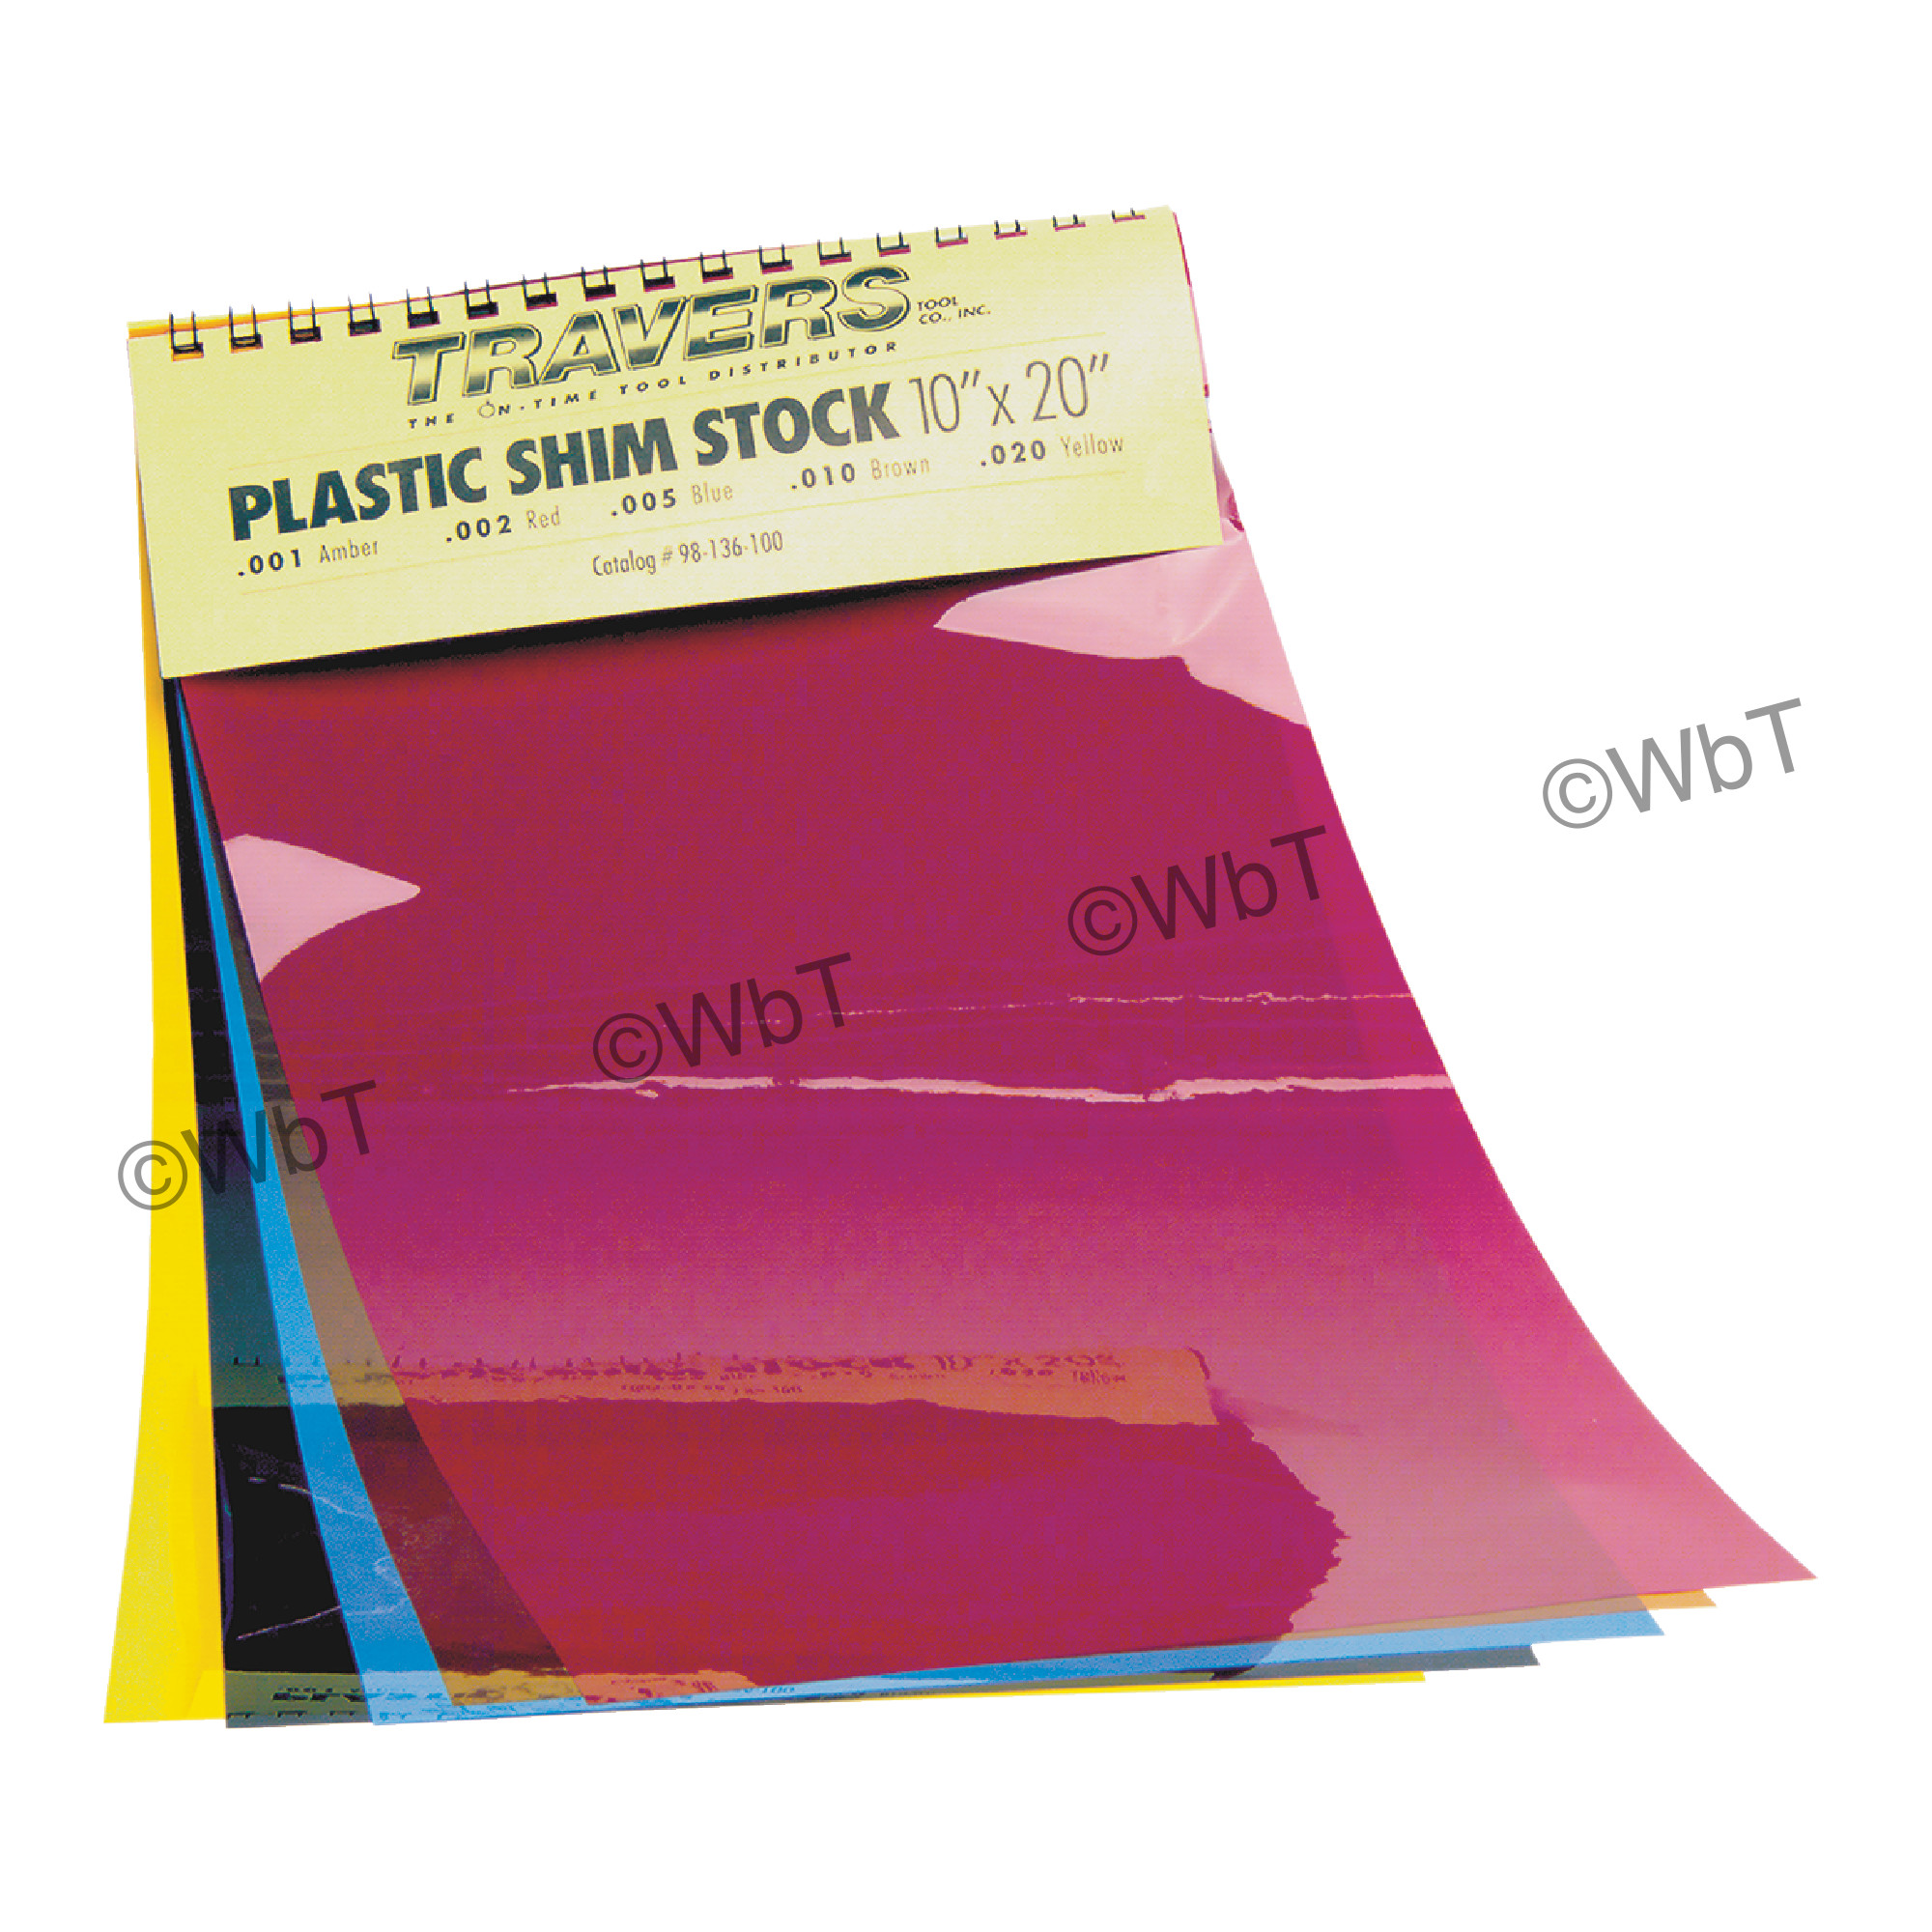 Plastic Shim Sheet Stock Assortment